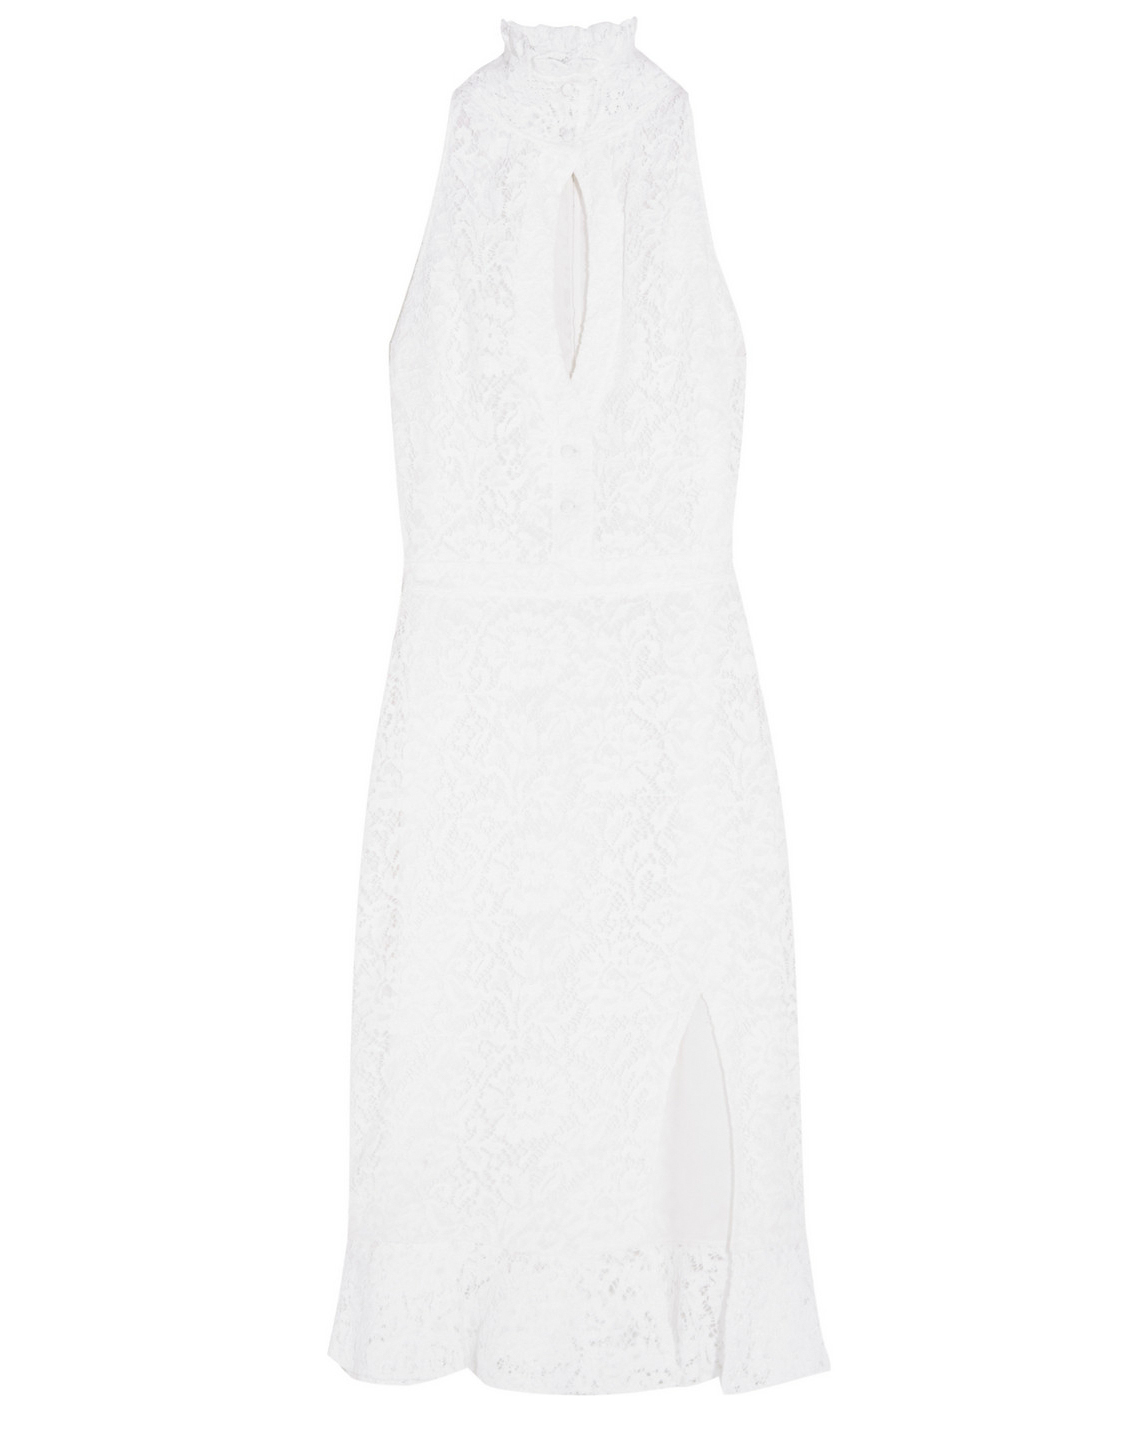 little-white-dress-altuzarra-nap-1115.jpg